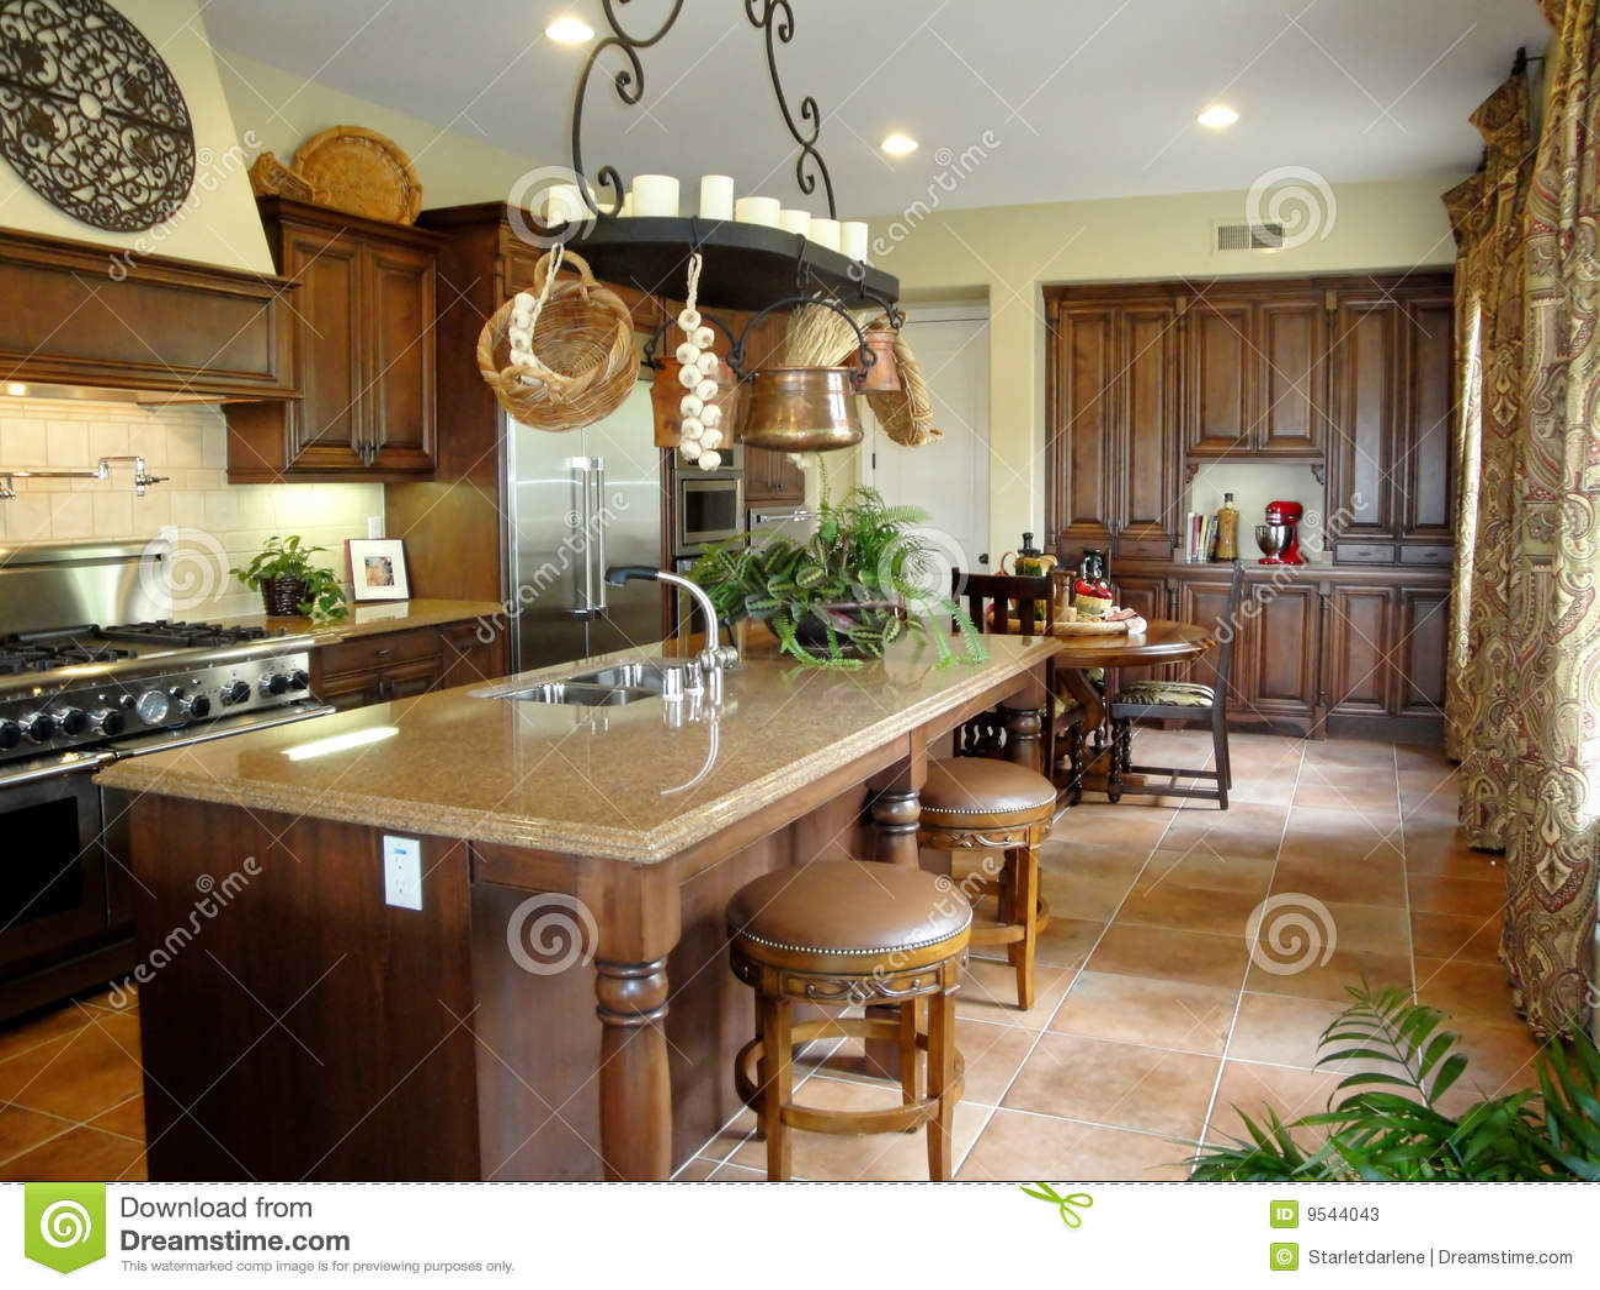 industrial kitchen stools european gadgets 美好的意大利厨房样式库存图片 图片包括有厨房 凳子 计数器 灌肠器 工具美好的美食的意大利厨房不锈钢样式